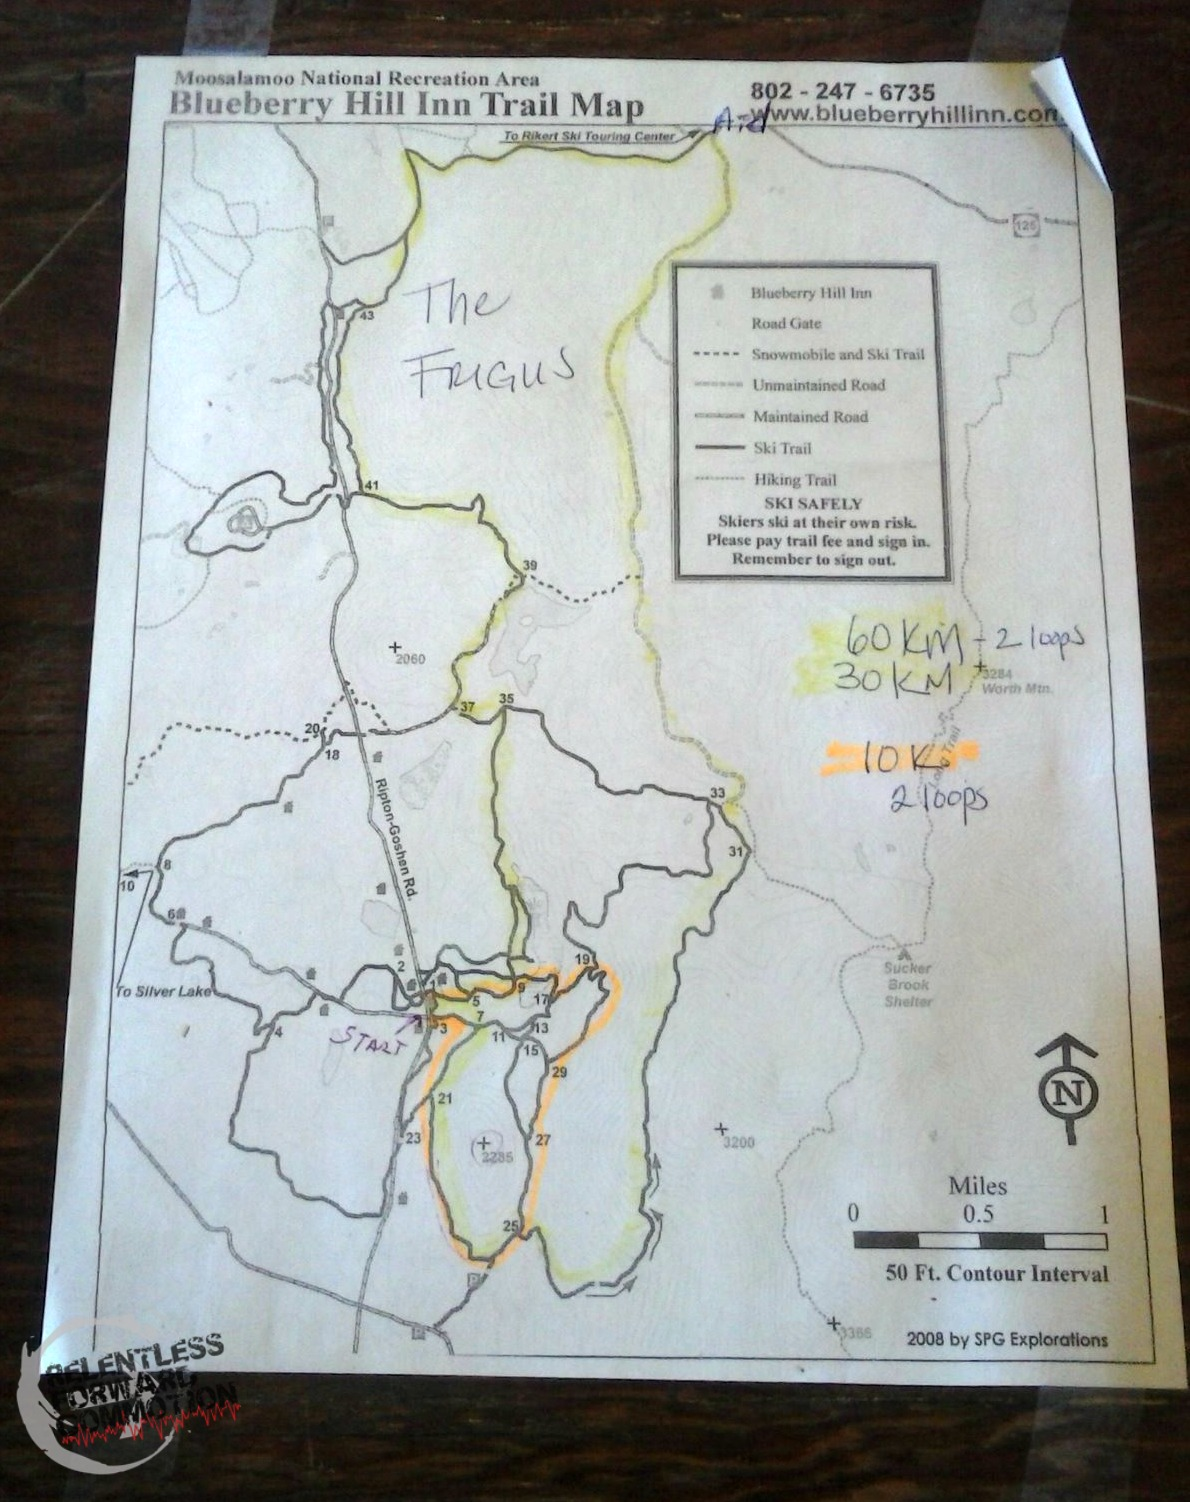 FRIGUS map